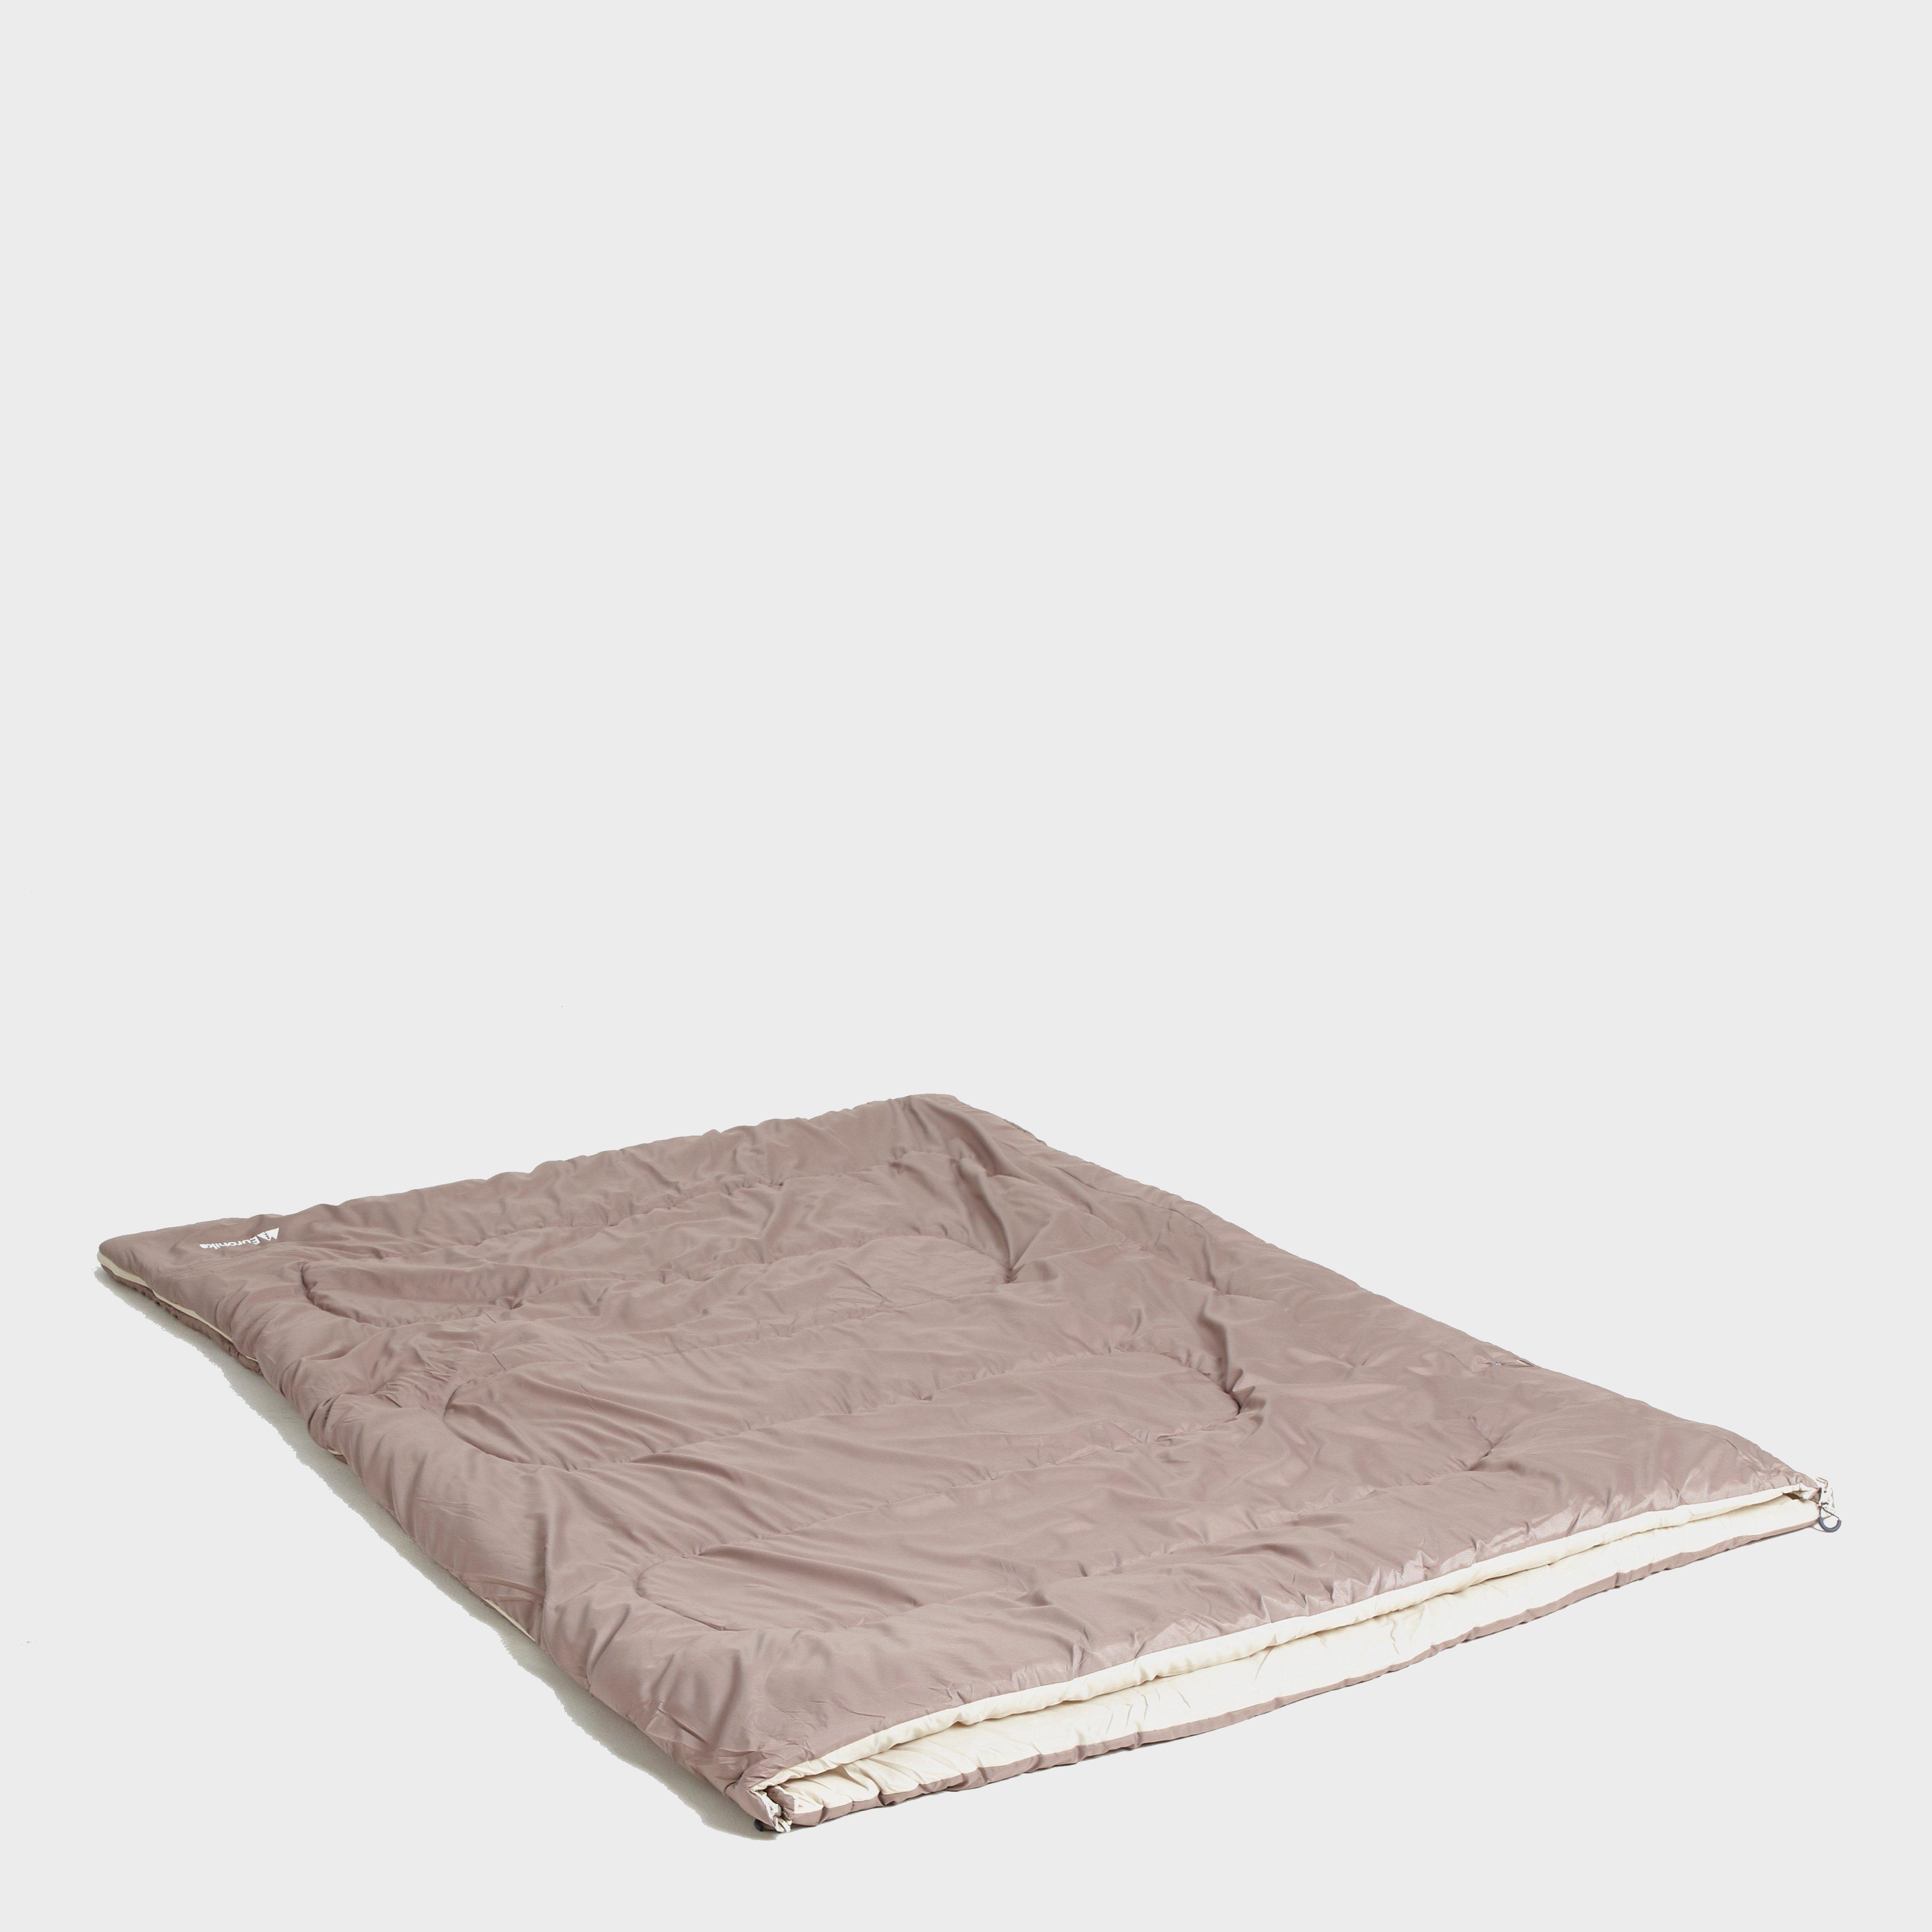 Eurohike Double Sleeping Bag, Beige